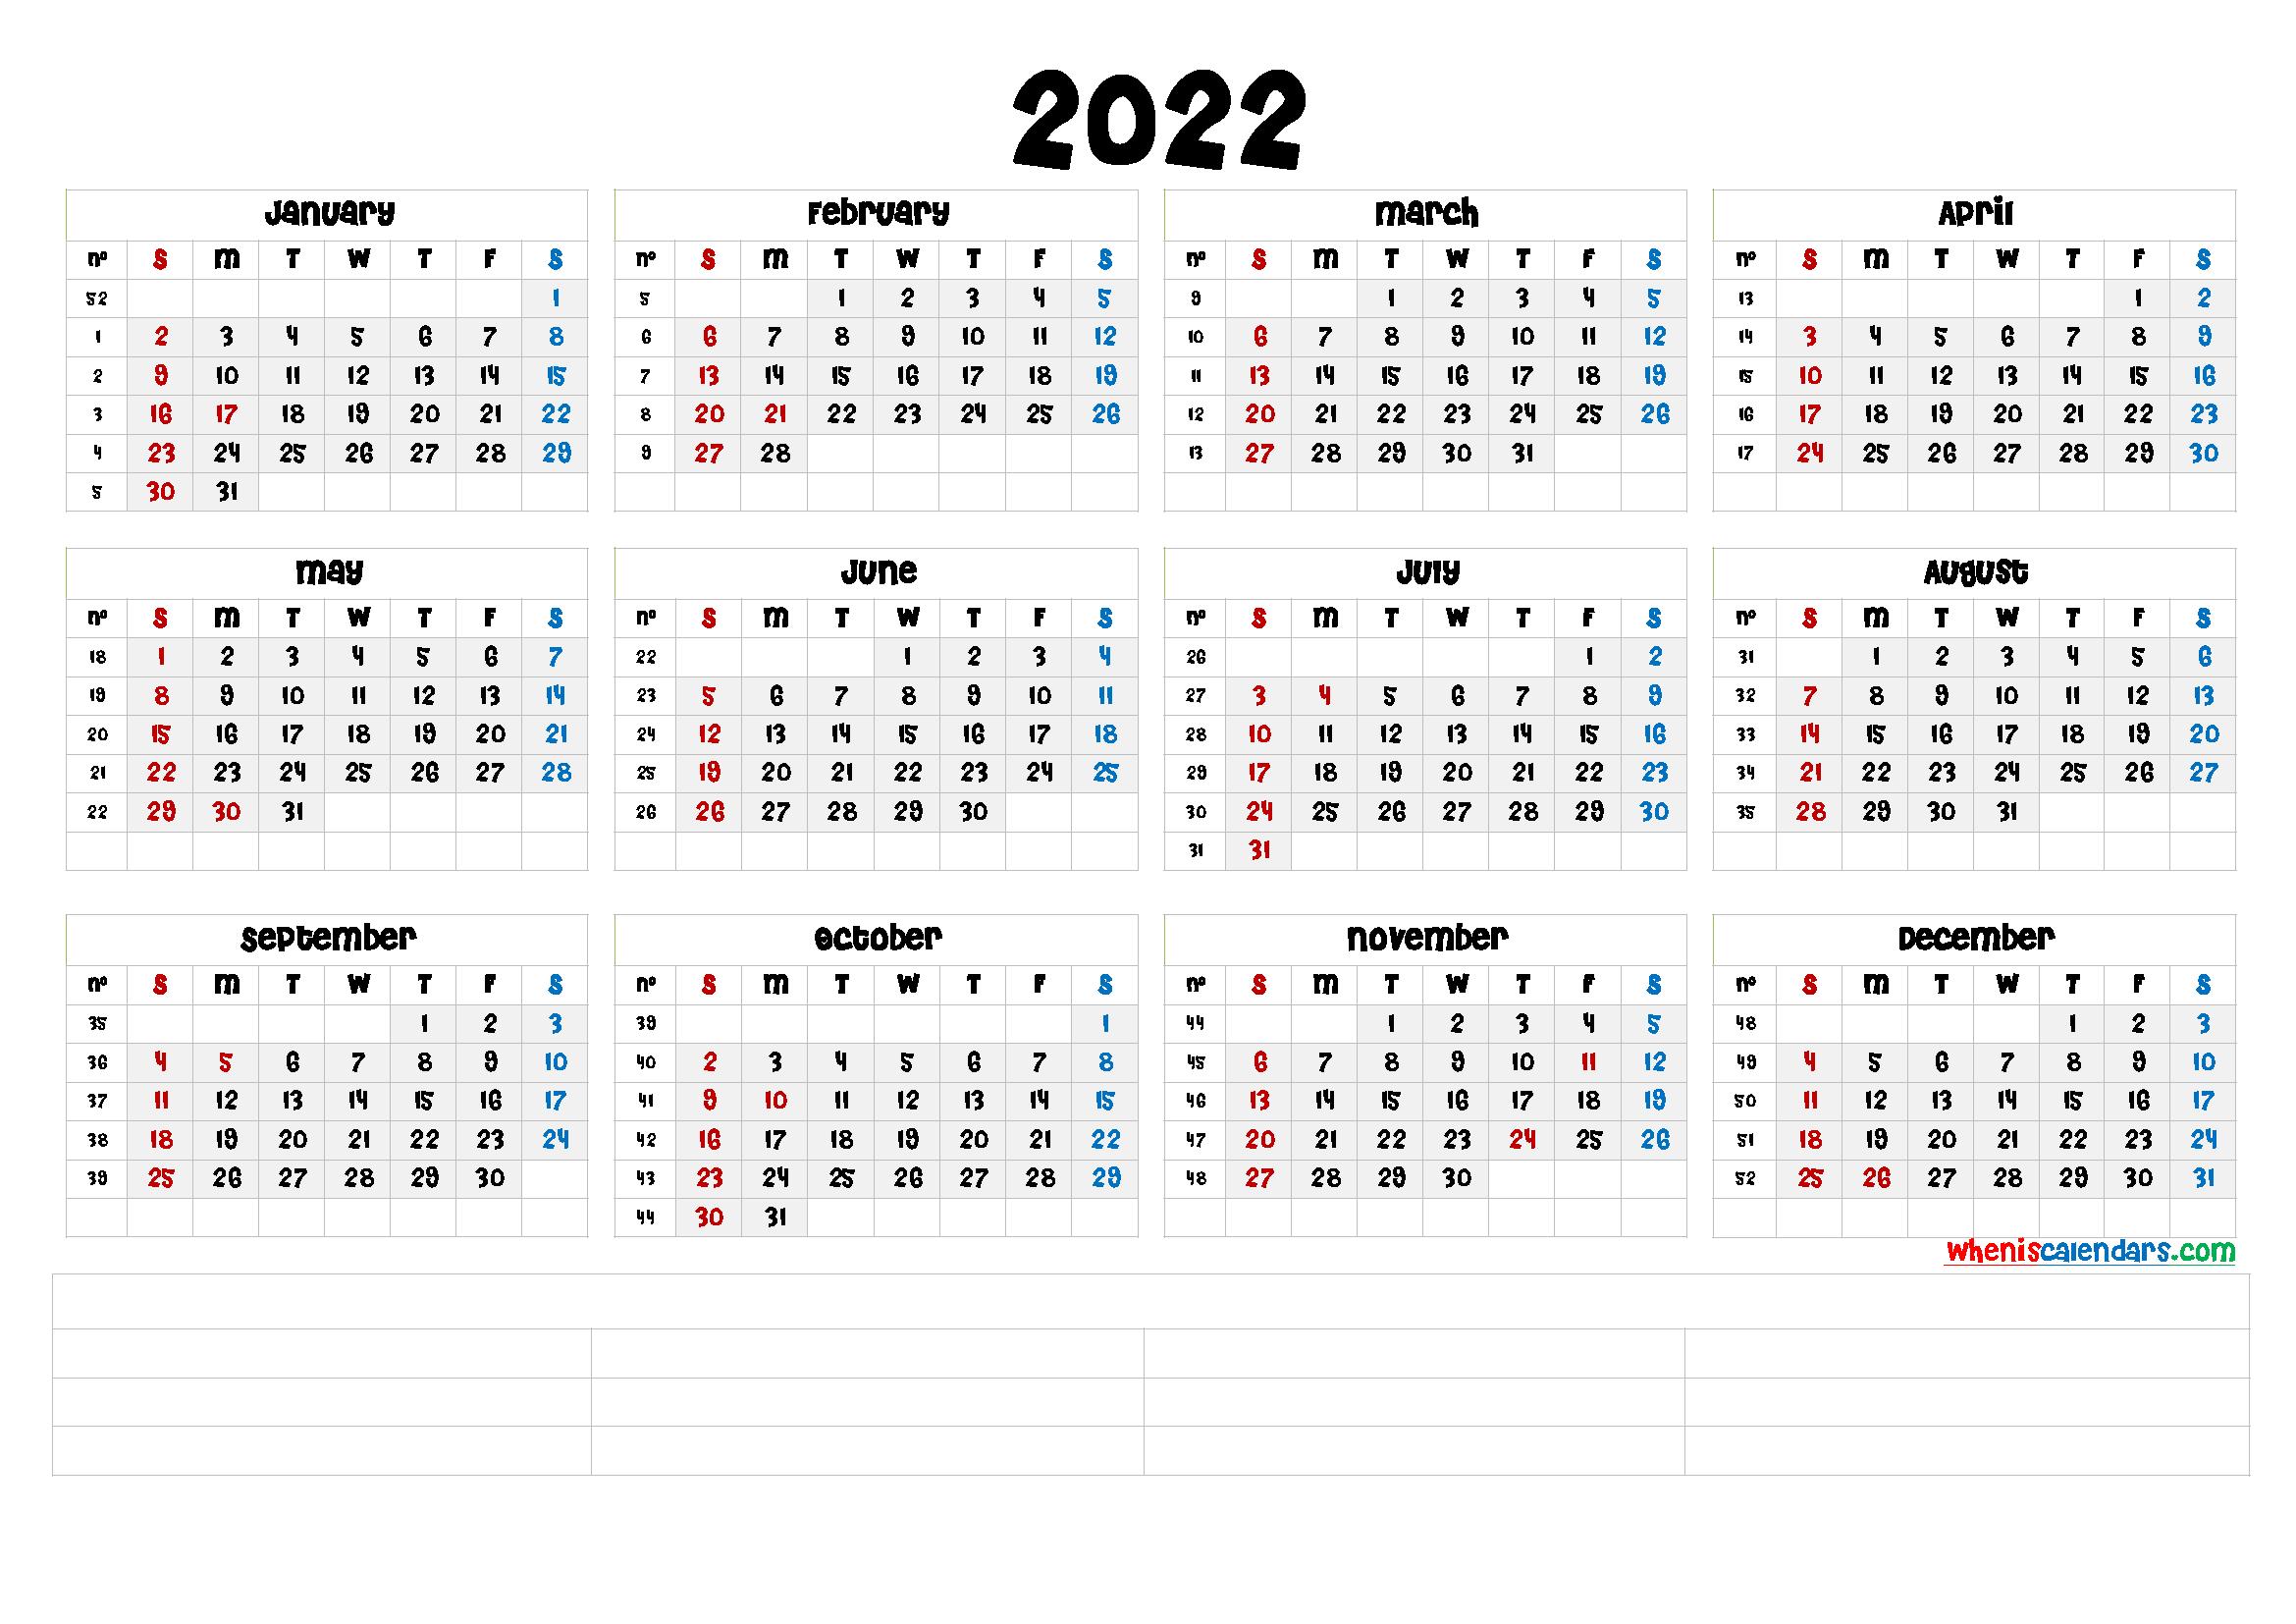 Calendar 2022 Template Free